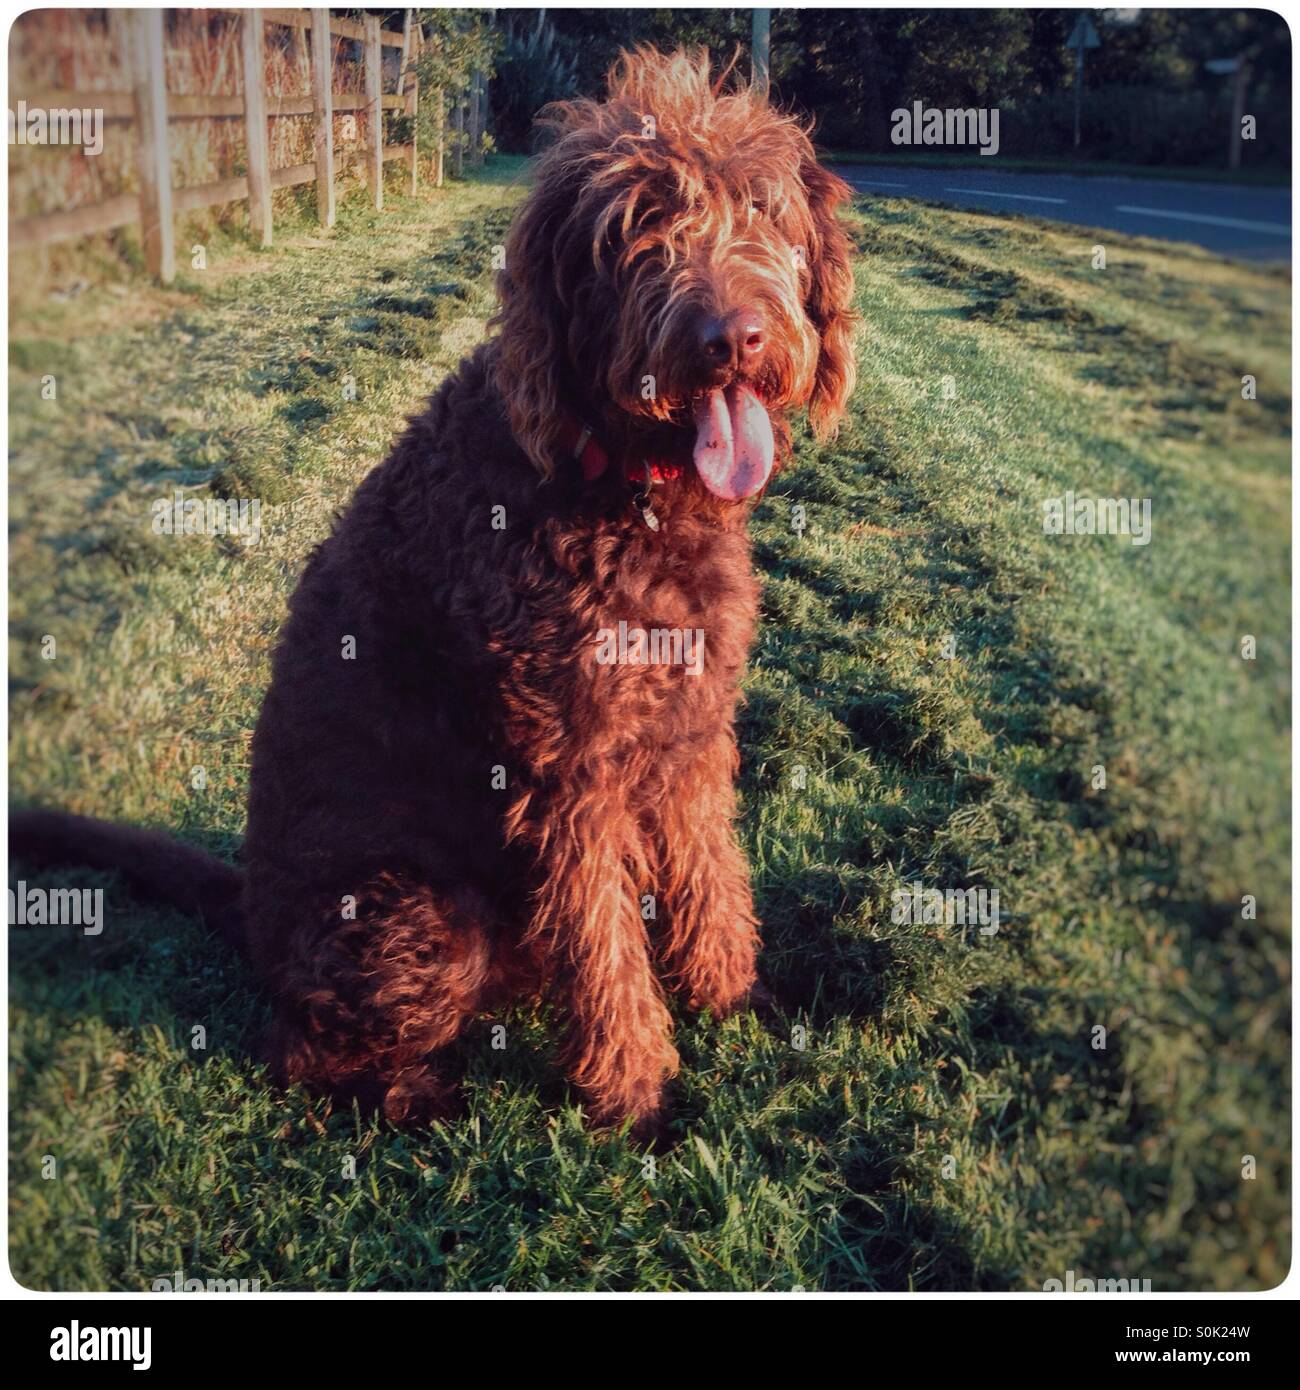 Chocolate brown labradoodle dog. - Stock Image